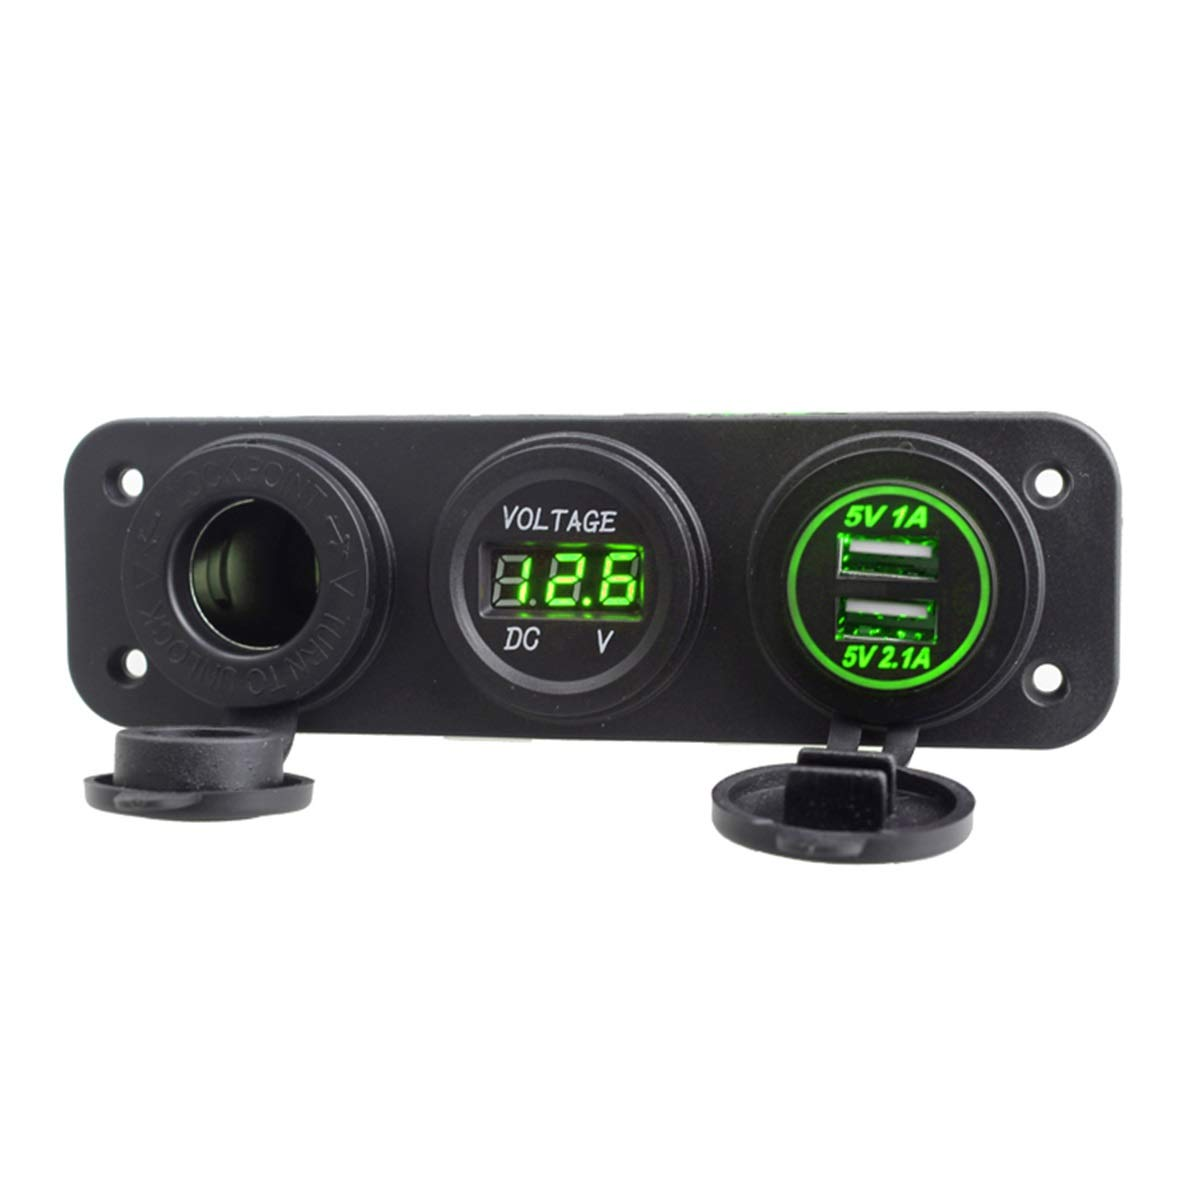 Green 12-24V Dual USB Port Car Charger Power Adaptor Splitter Socket